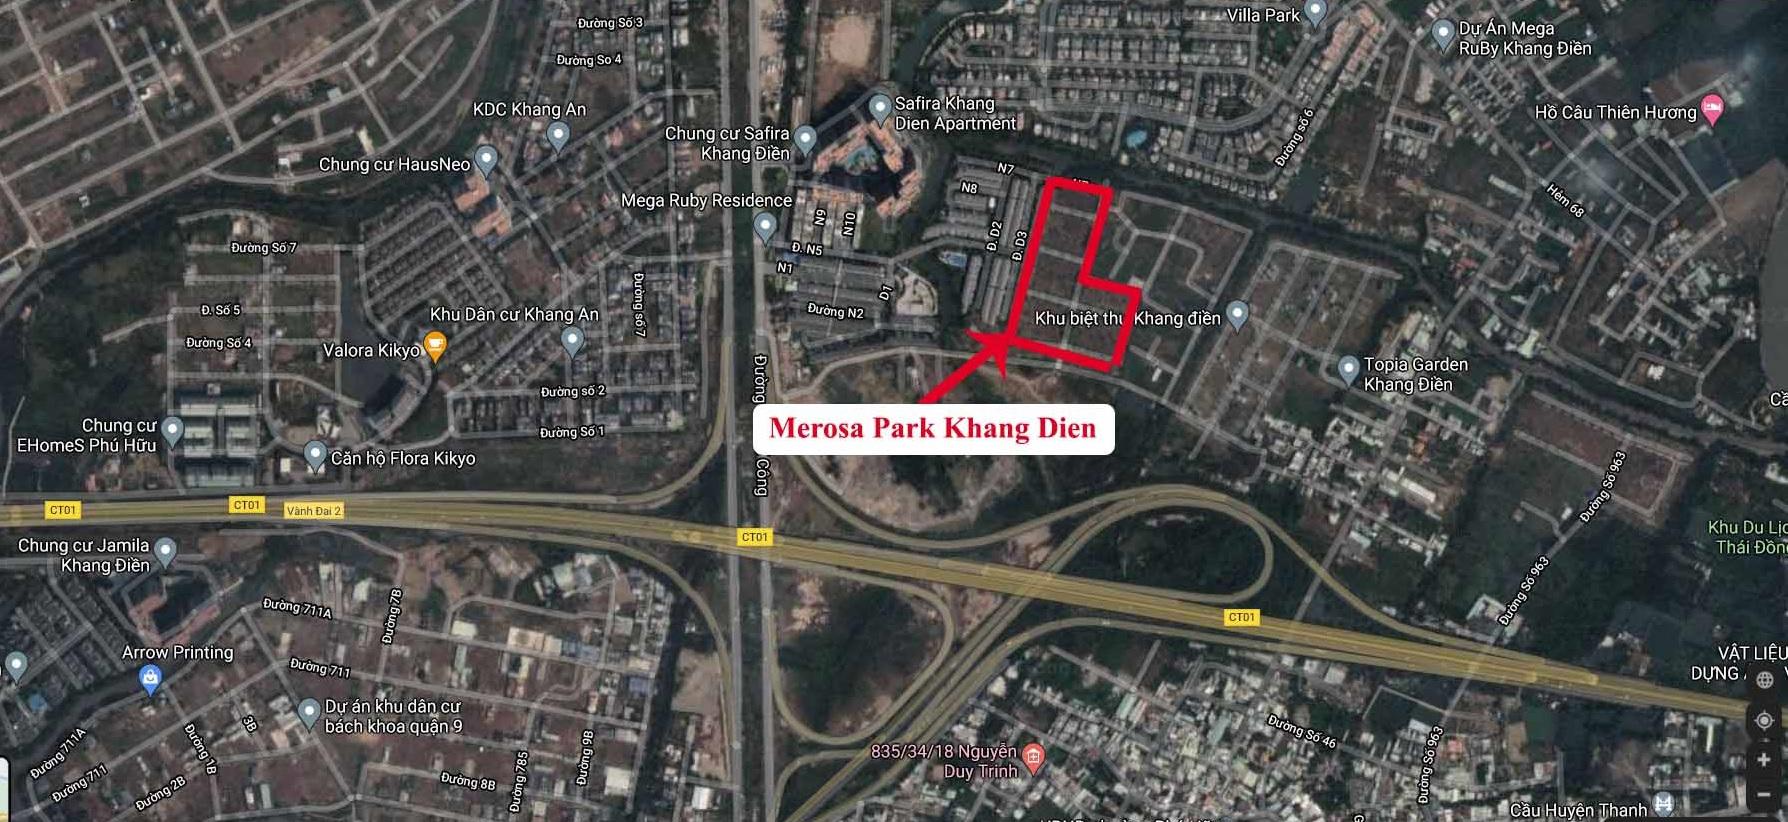 tiện ích ngoại khu Merosa Park